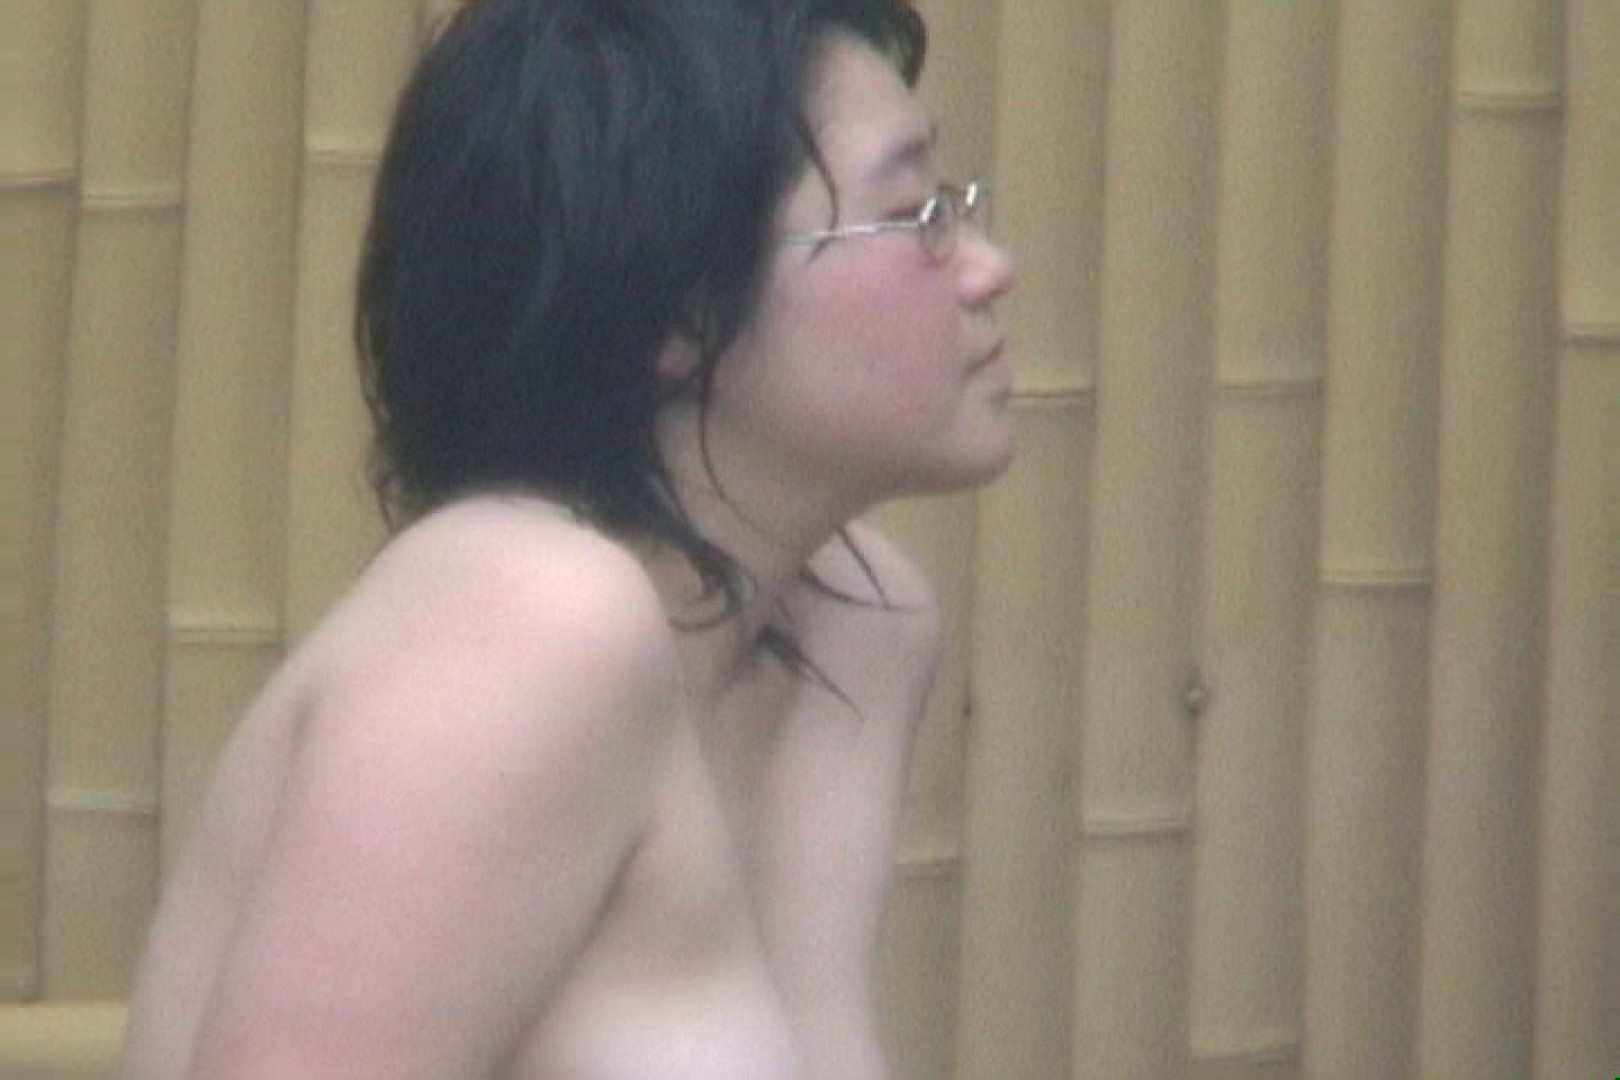 Aquaな露天風呂Vol.46【VIP限定】 HなOL | 露天  90pic 64